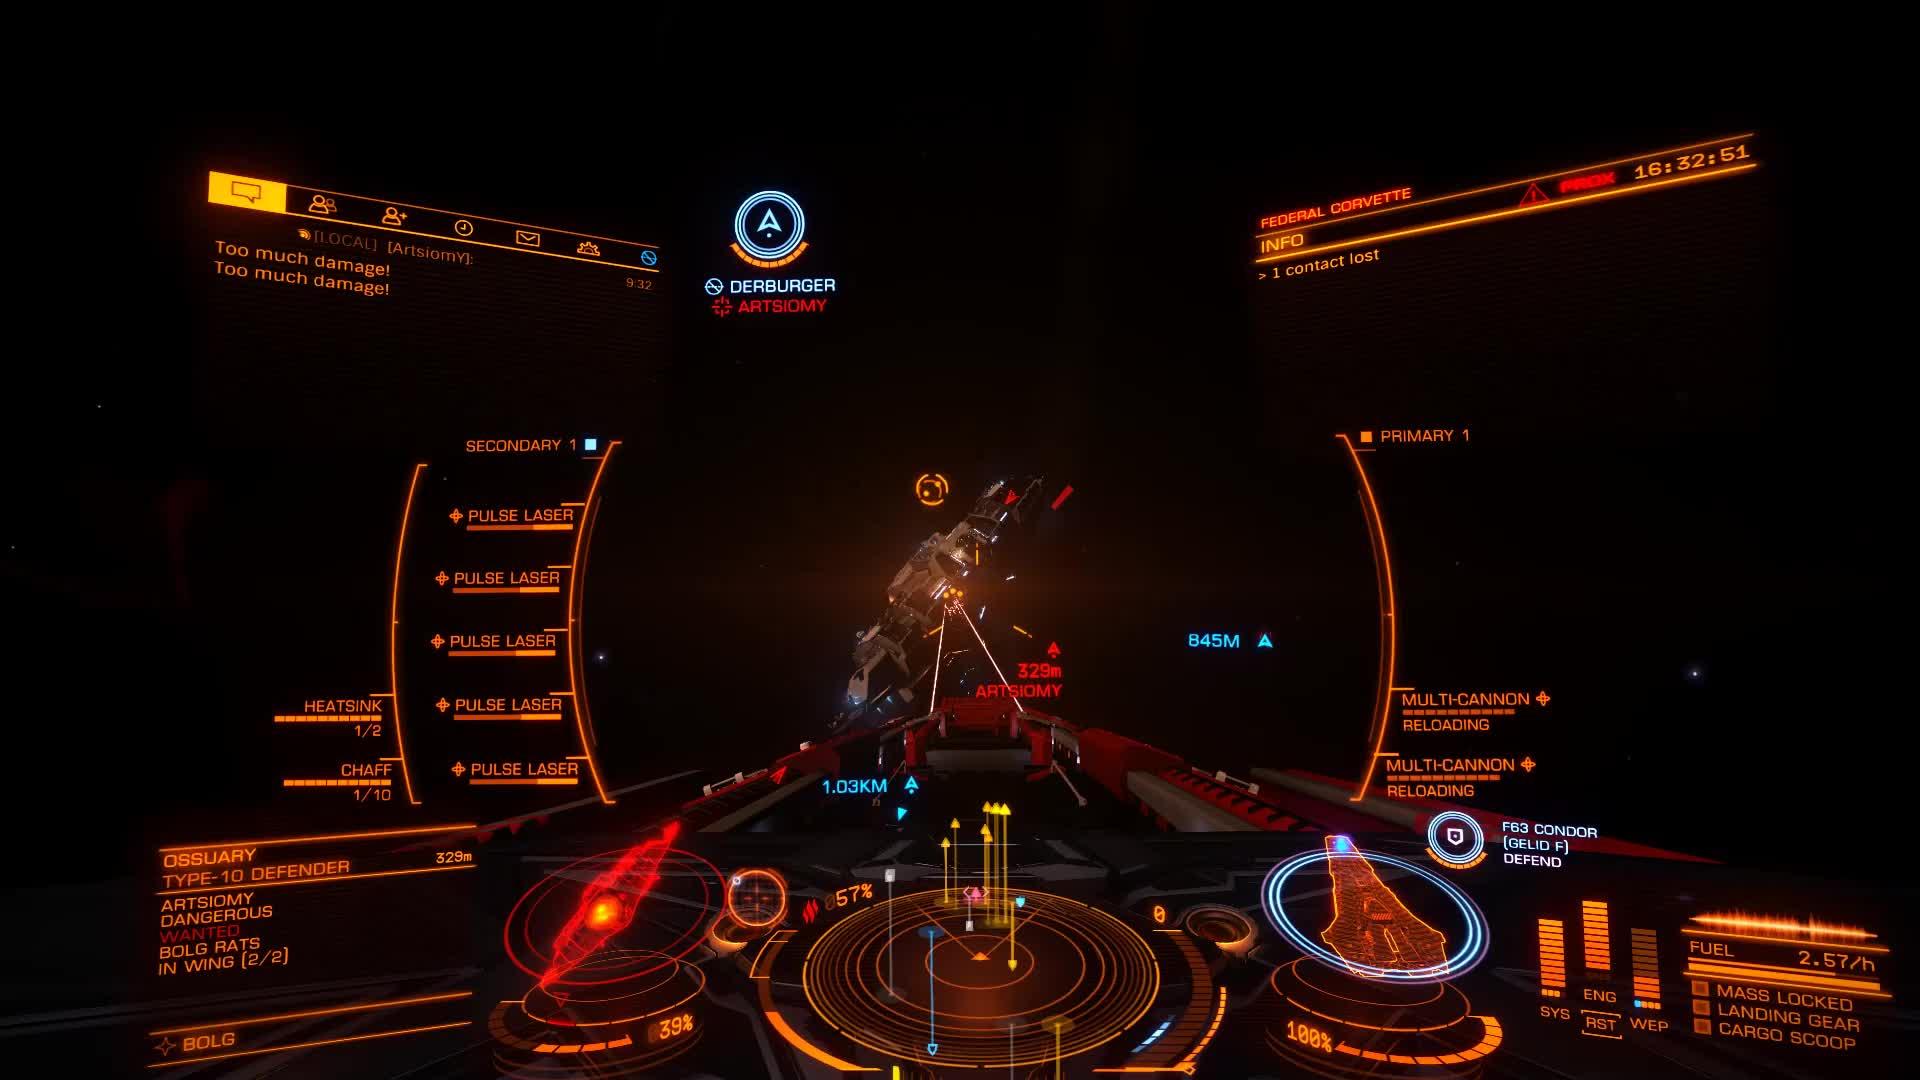 elitedangerous, DerBurger flying by in a guardian fighter GIFs